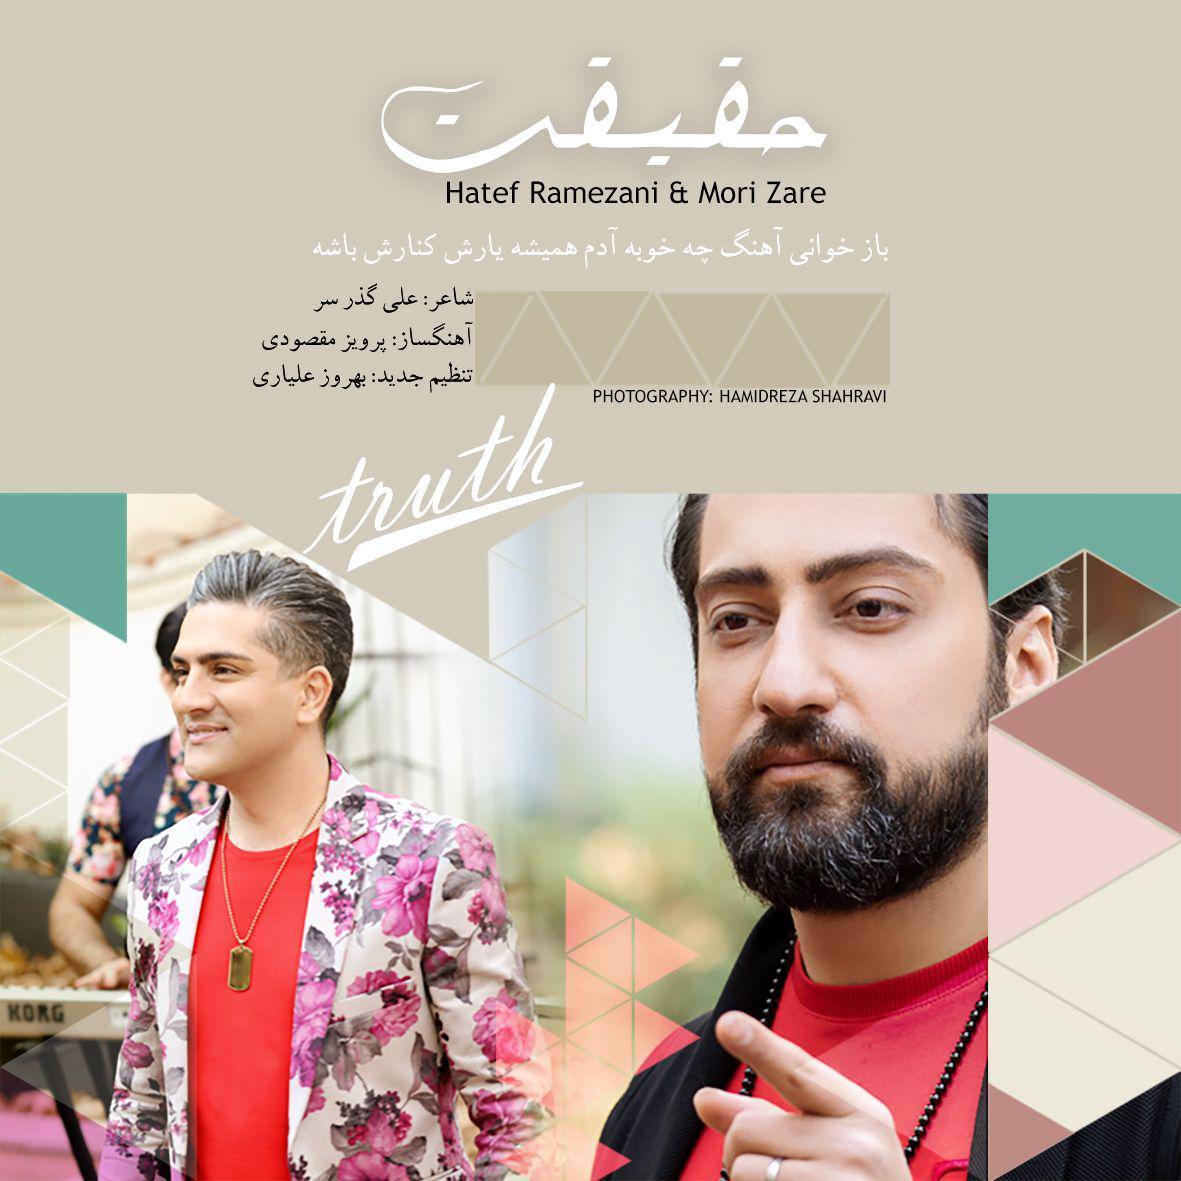 Hatef Ramezani - Haghighat Music   آهنگ هاتف رمضانی و موری زارع - قیقت